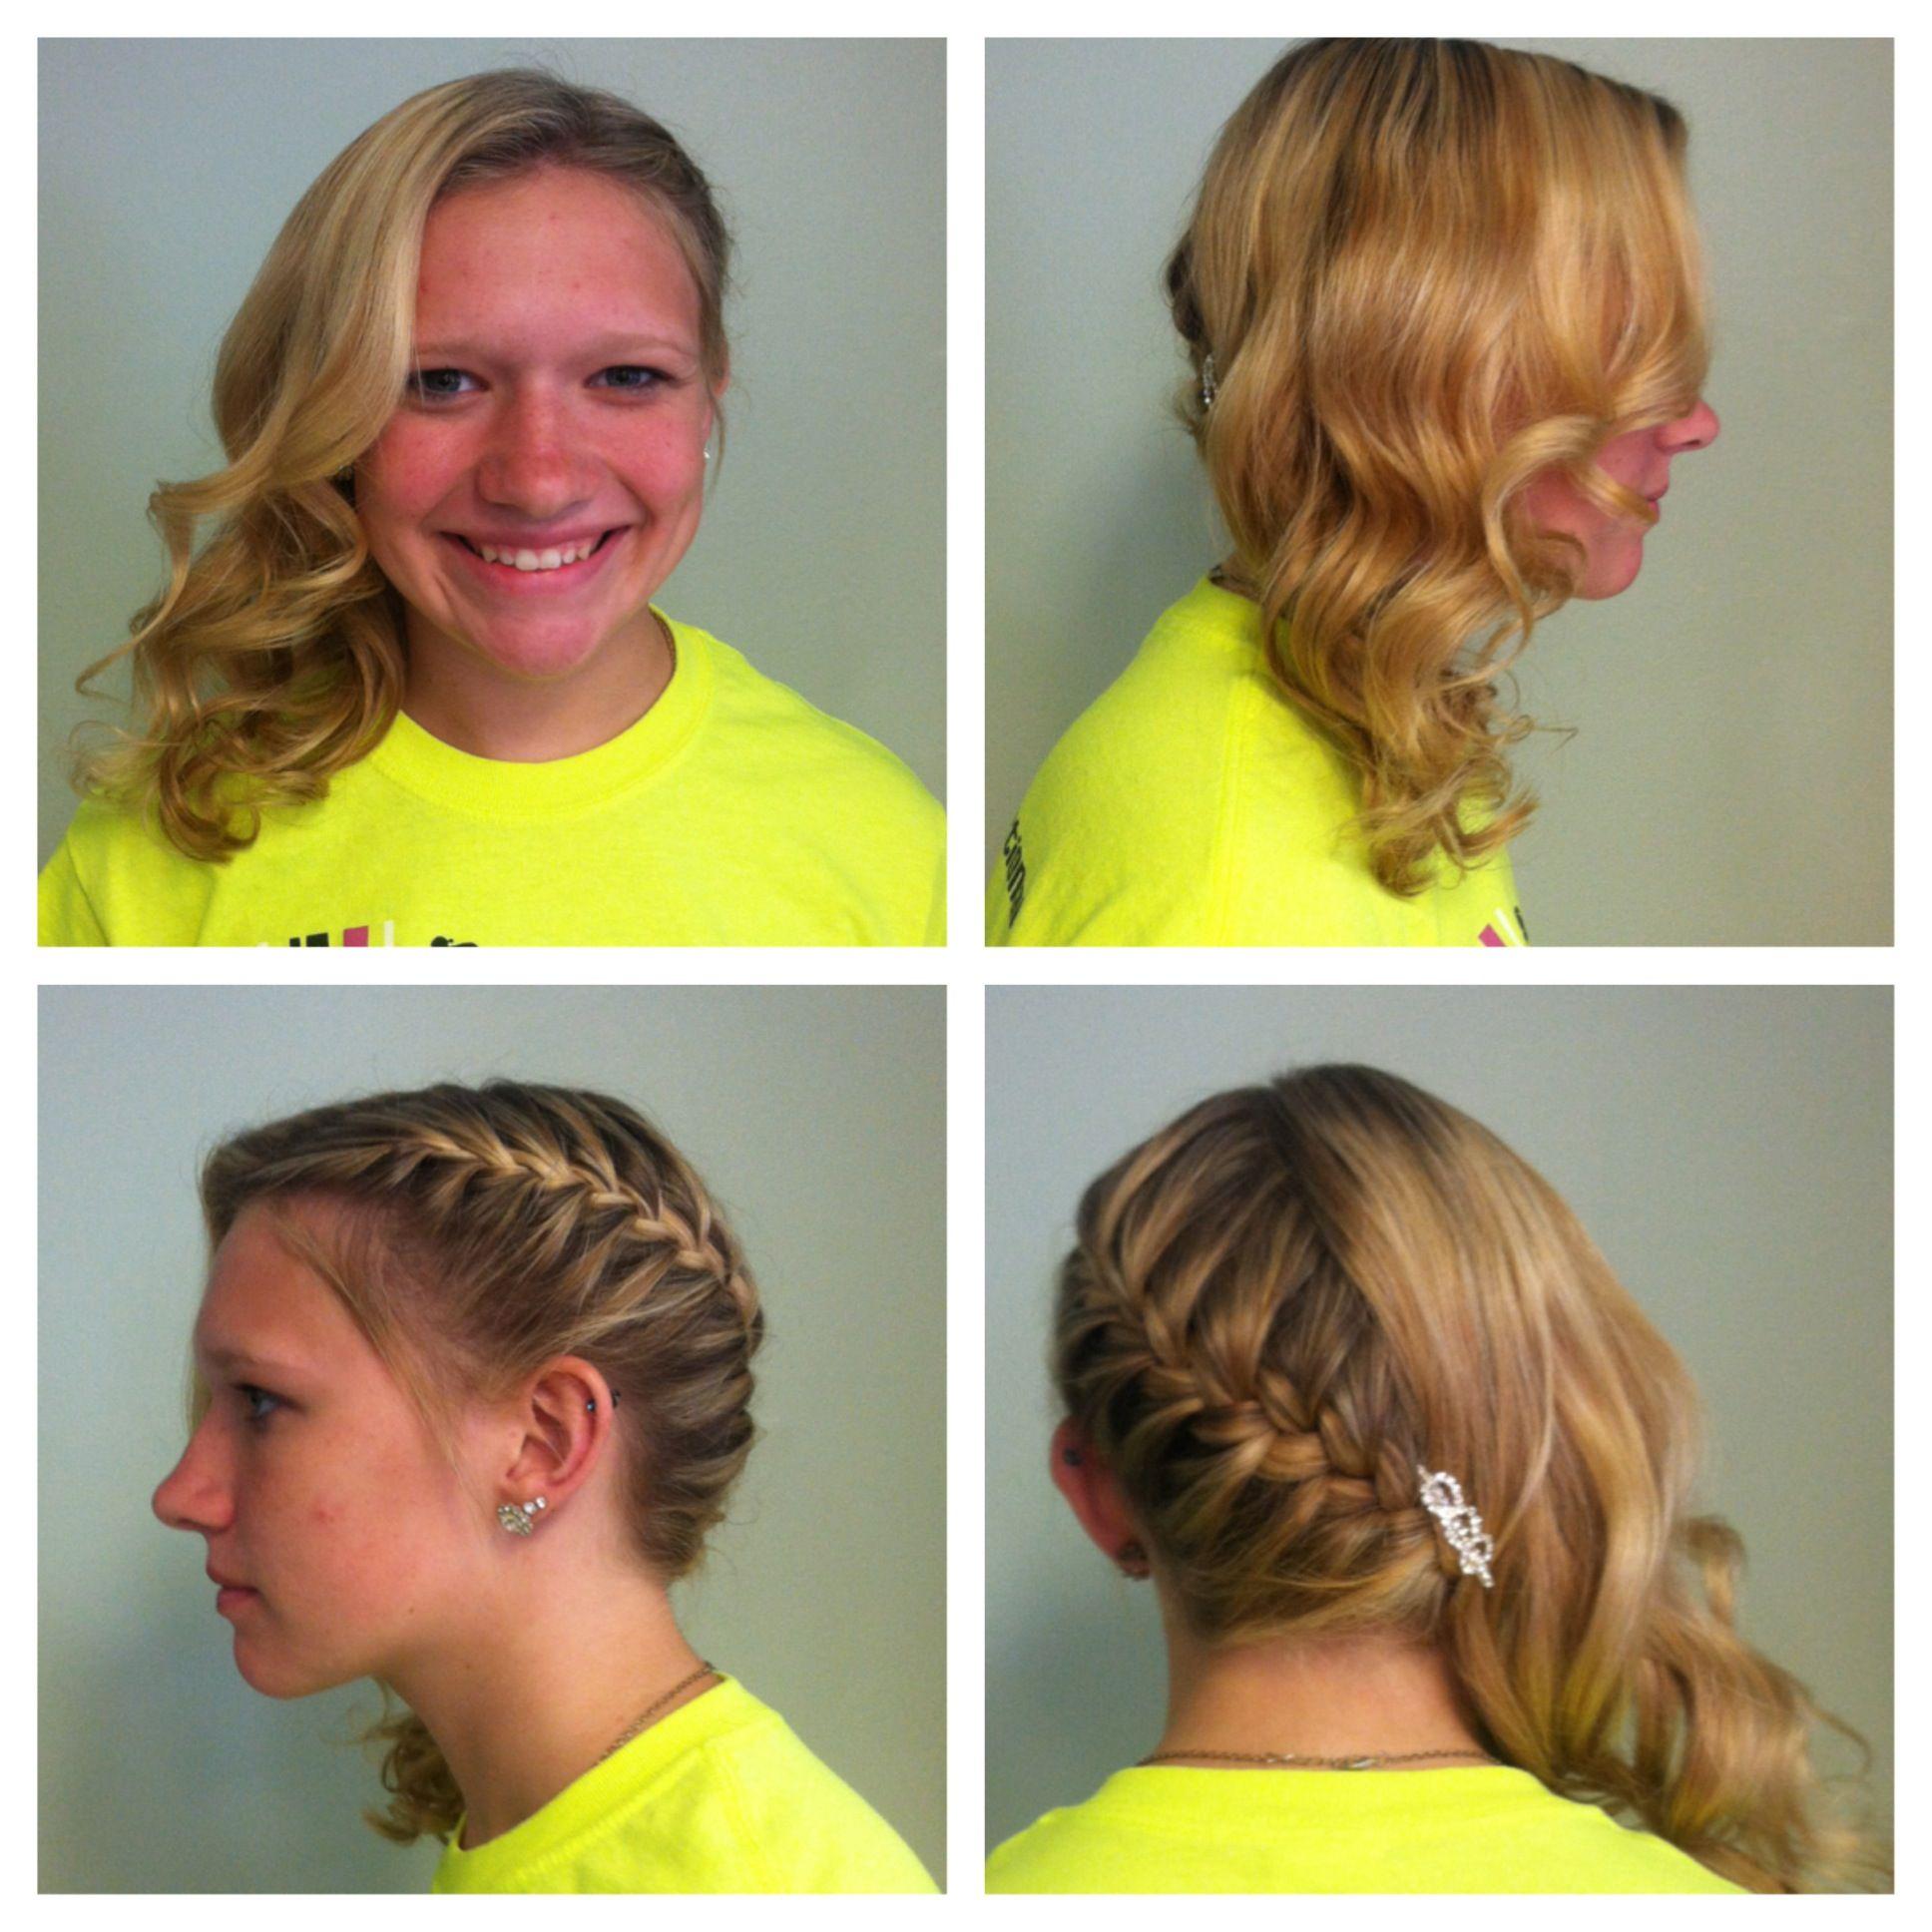 side braid updo curls style www.chezmichellesalon.com https://www.facebook.com/chezmichellesalon